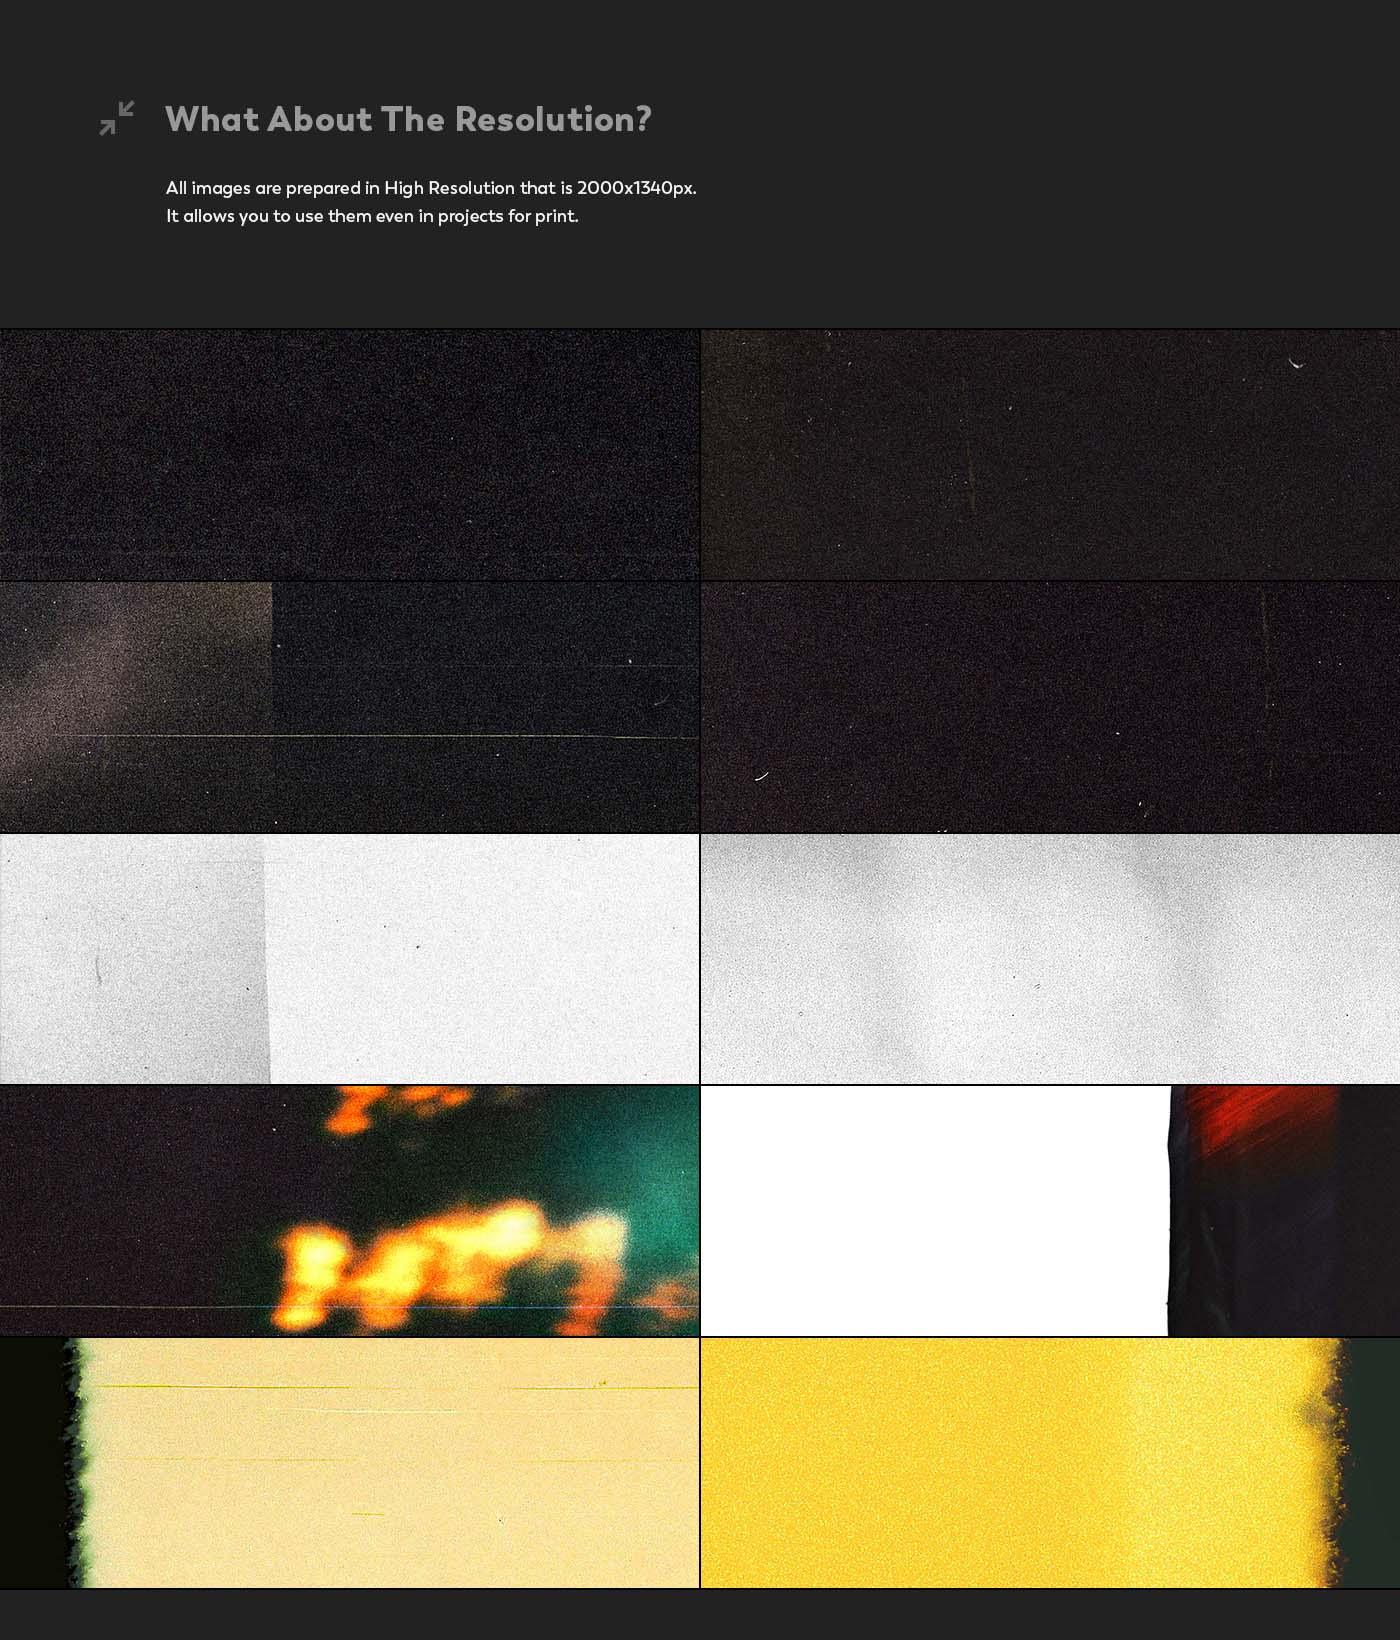 Film-Grain-Textures-Free